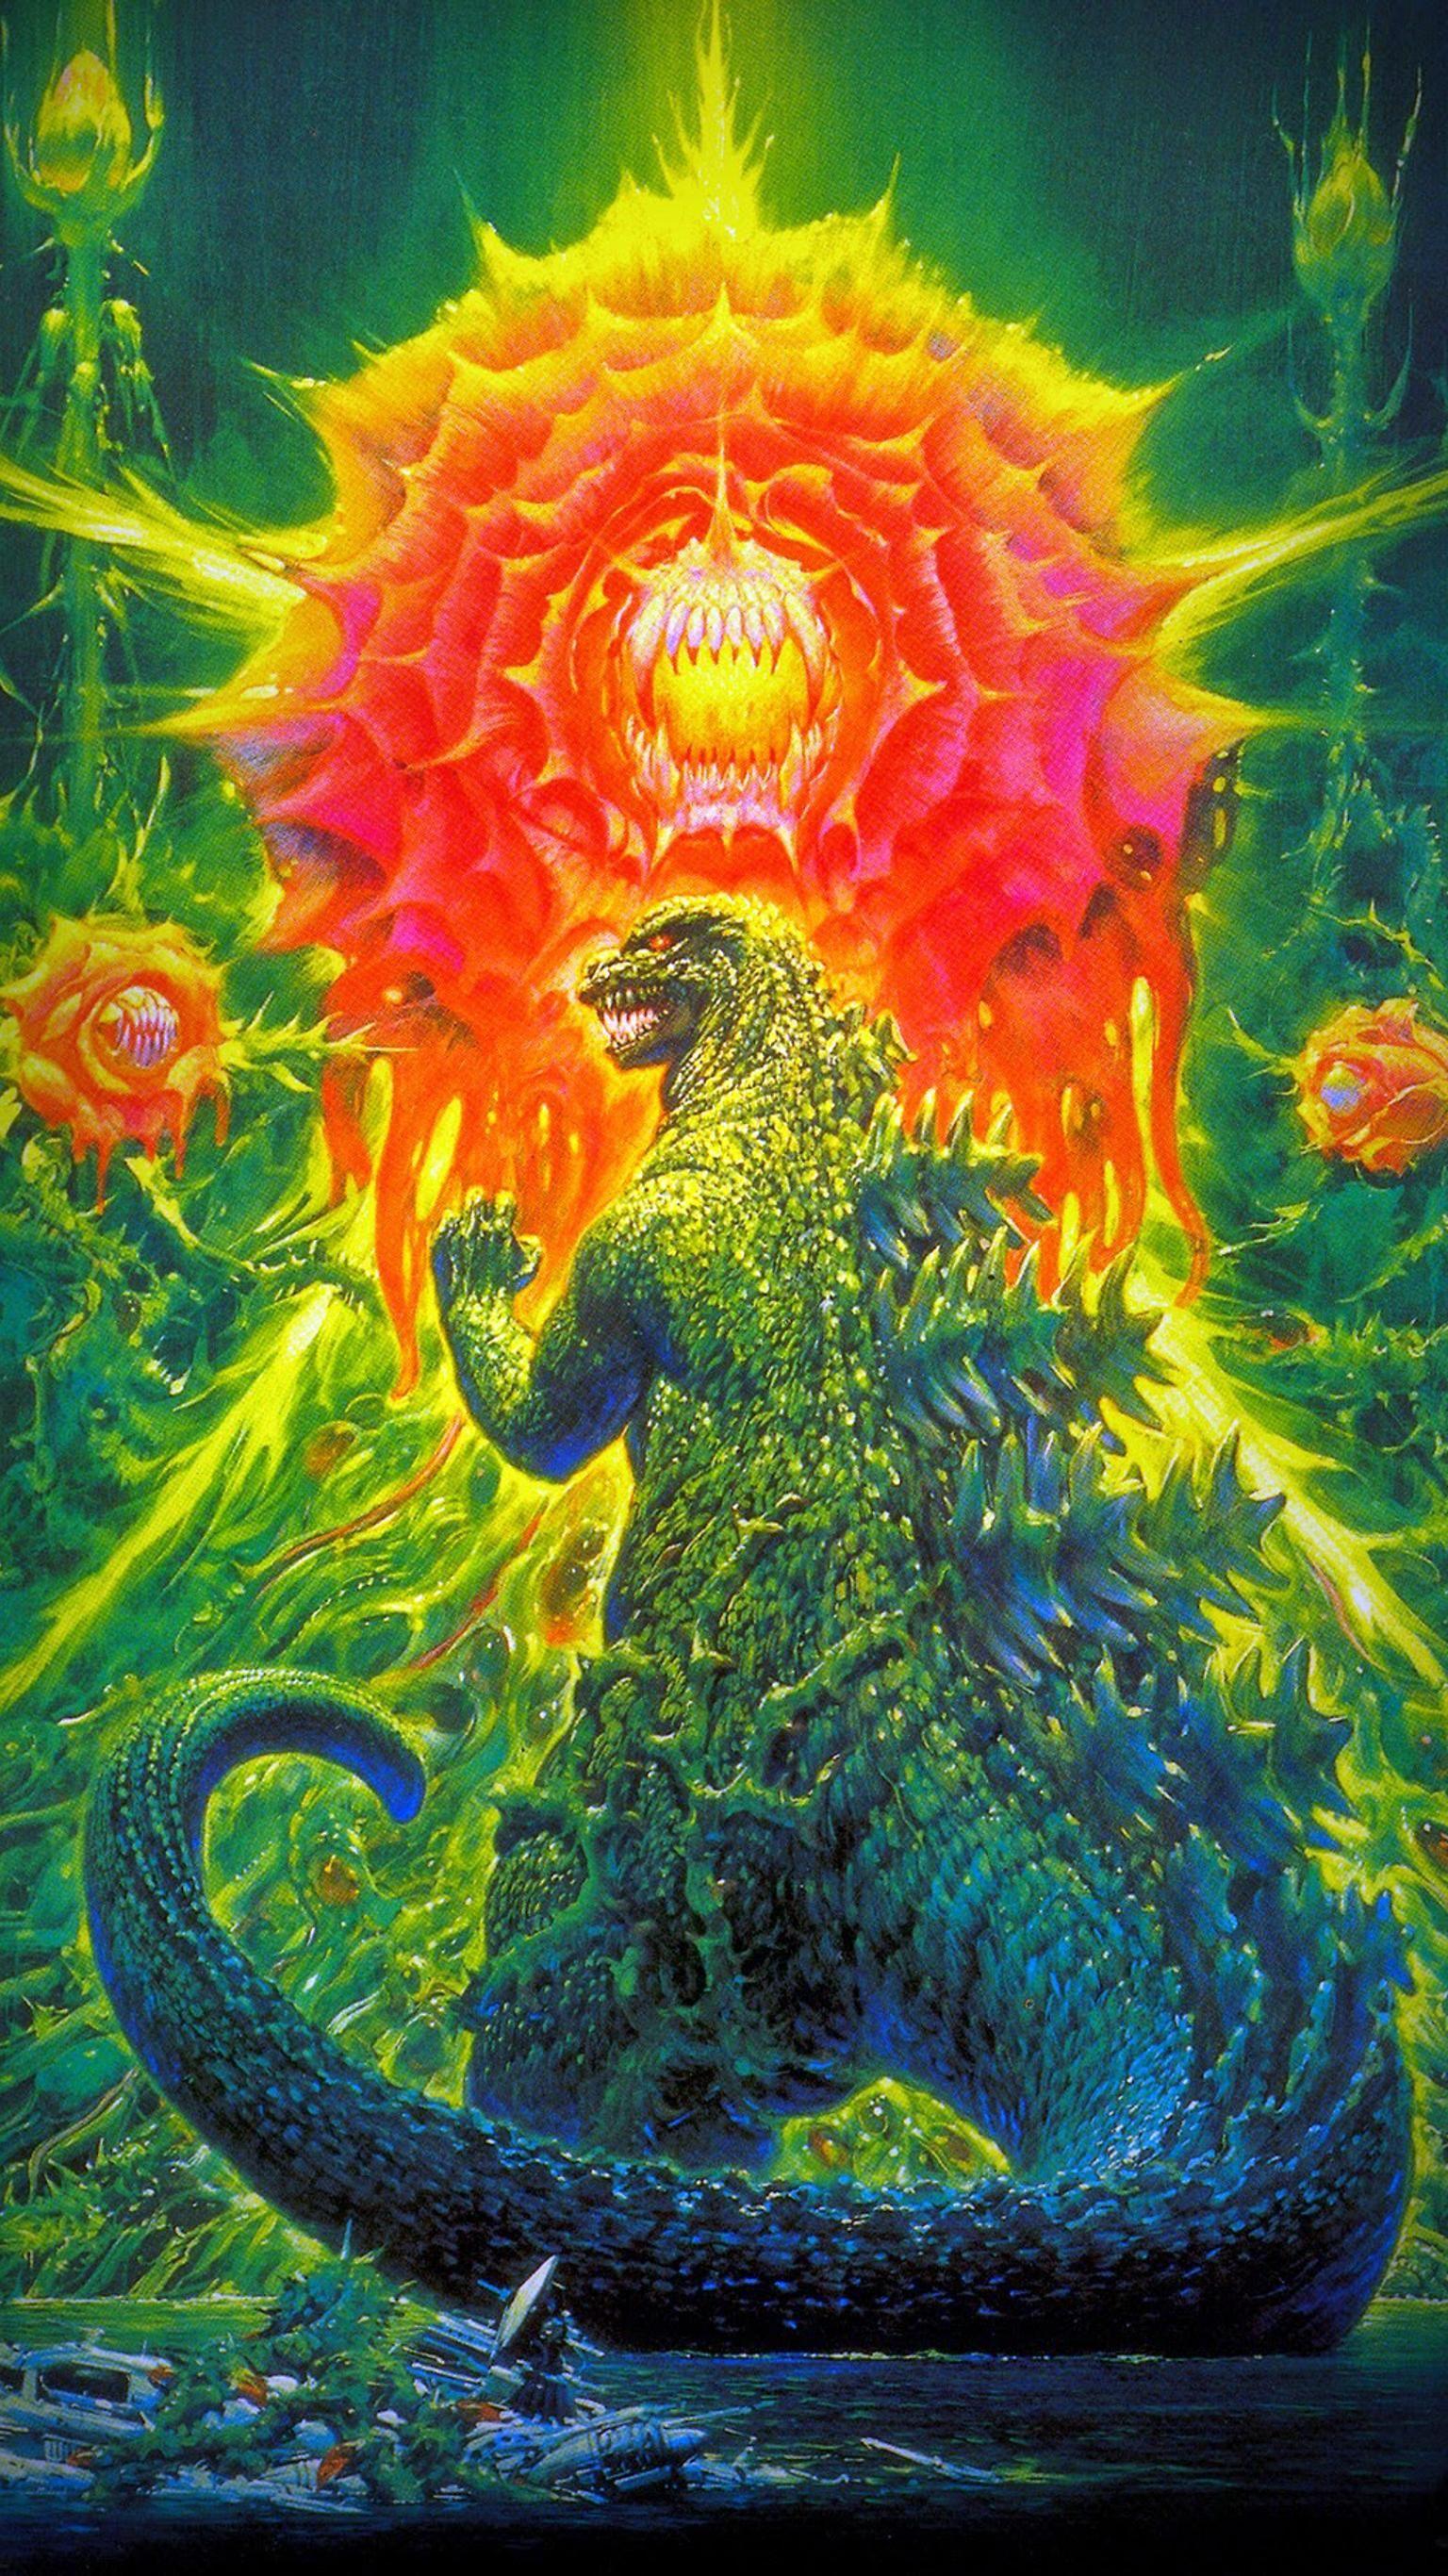 Godzilla vs Biollante 1989 Phone Wallpaper in 2019 Original 1536x2732